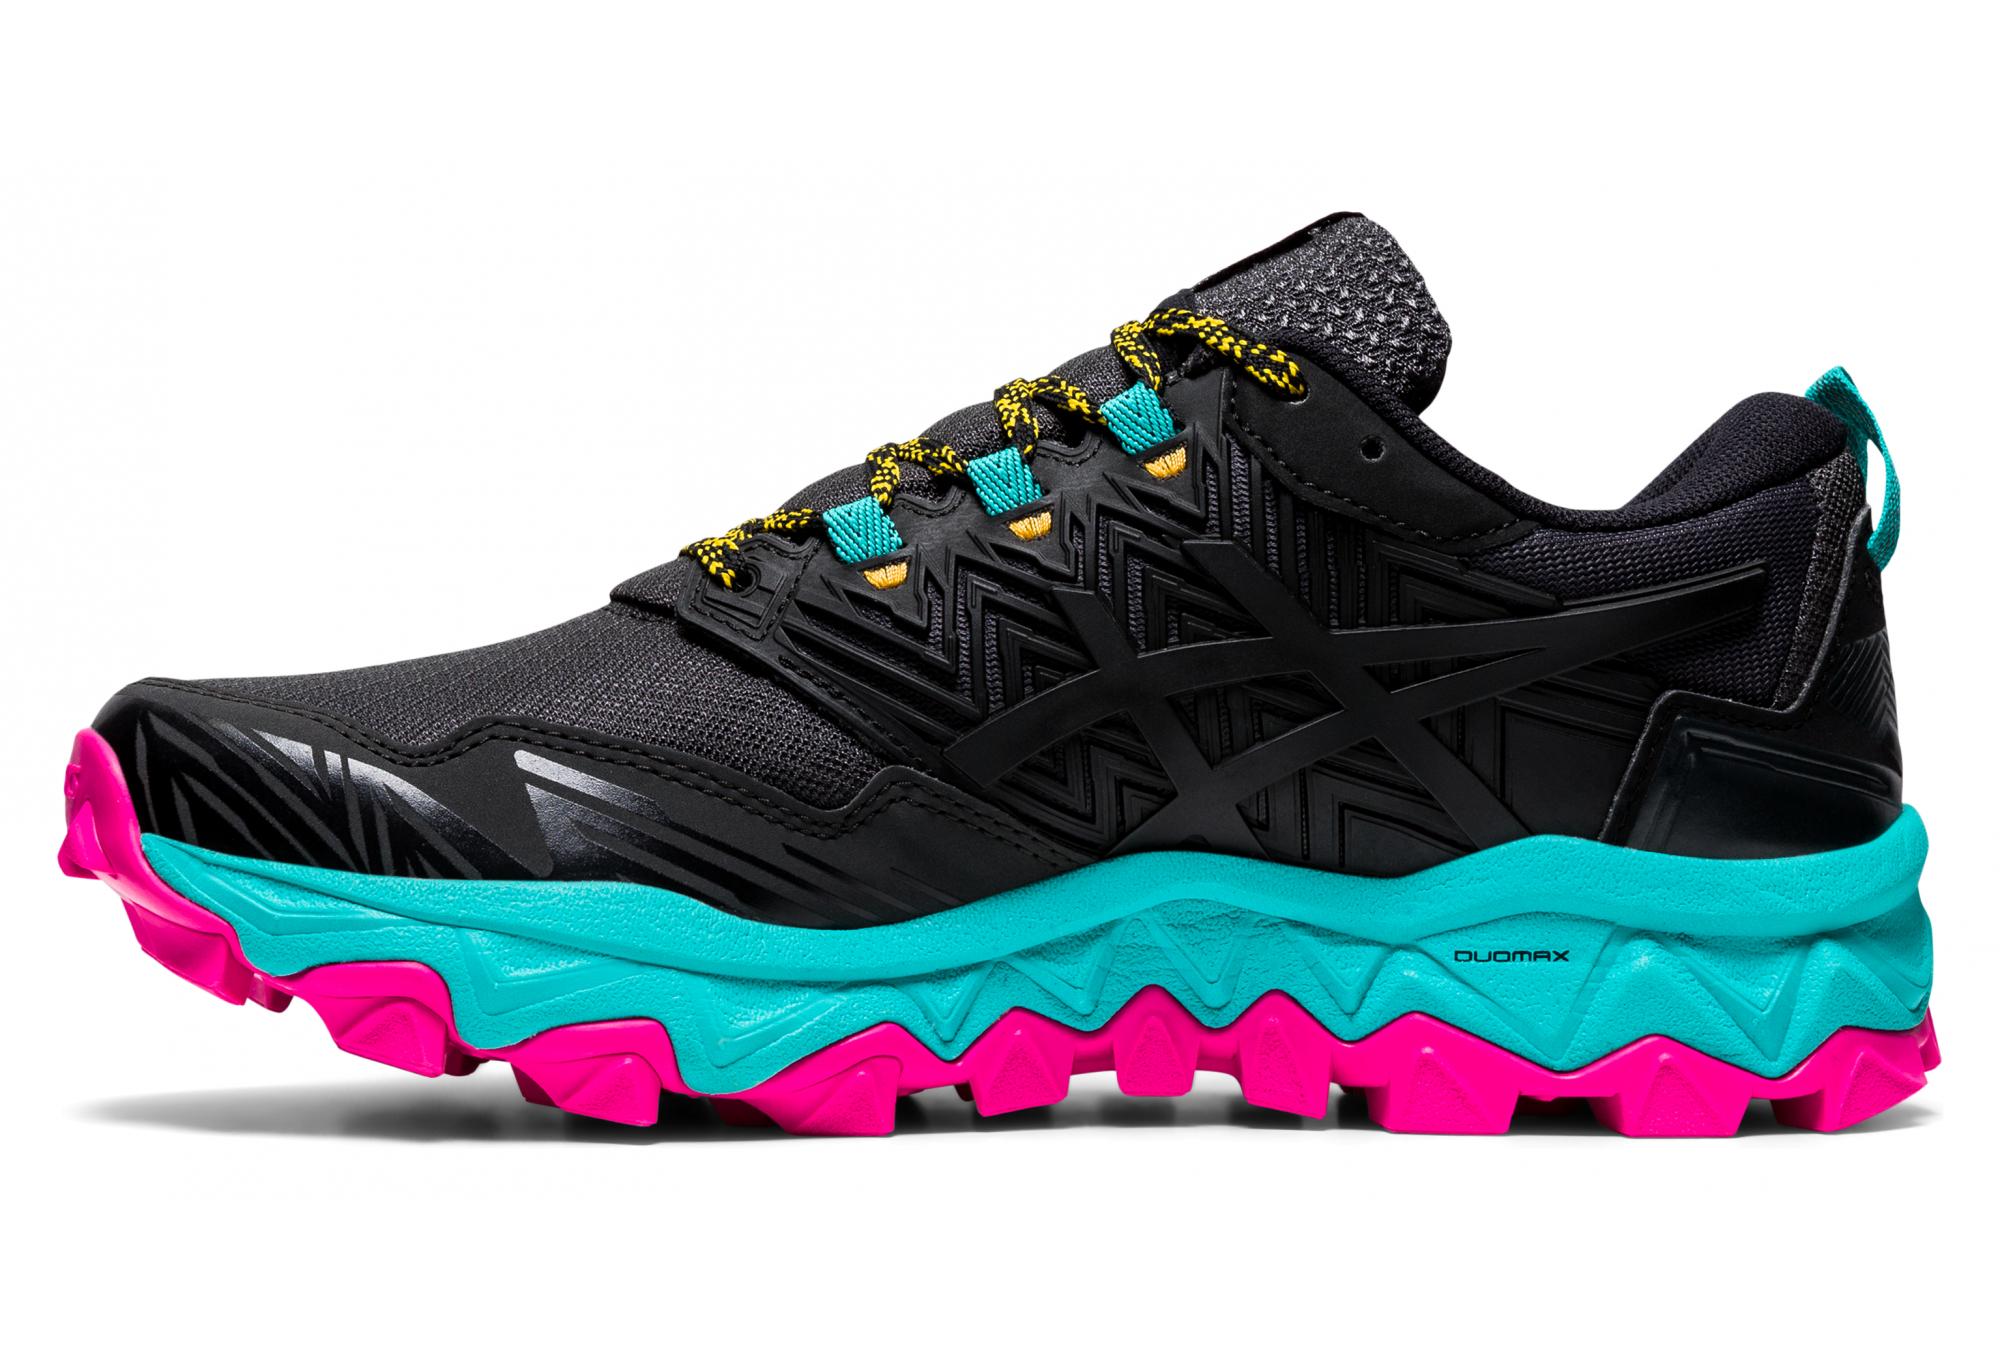 Chaussures de Trail Femme Asics Gel FujiTrabuco Noir / Rose ...